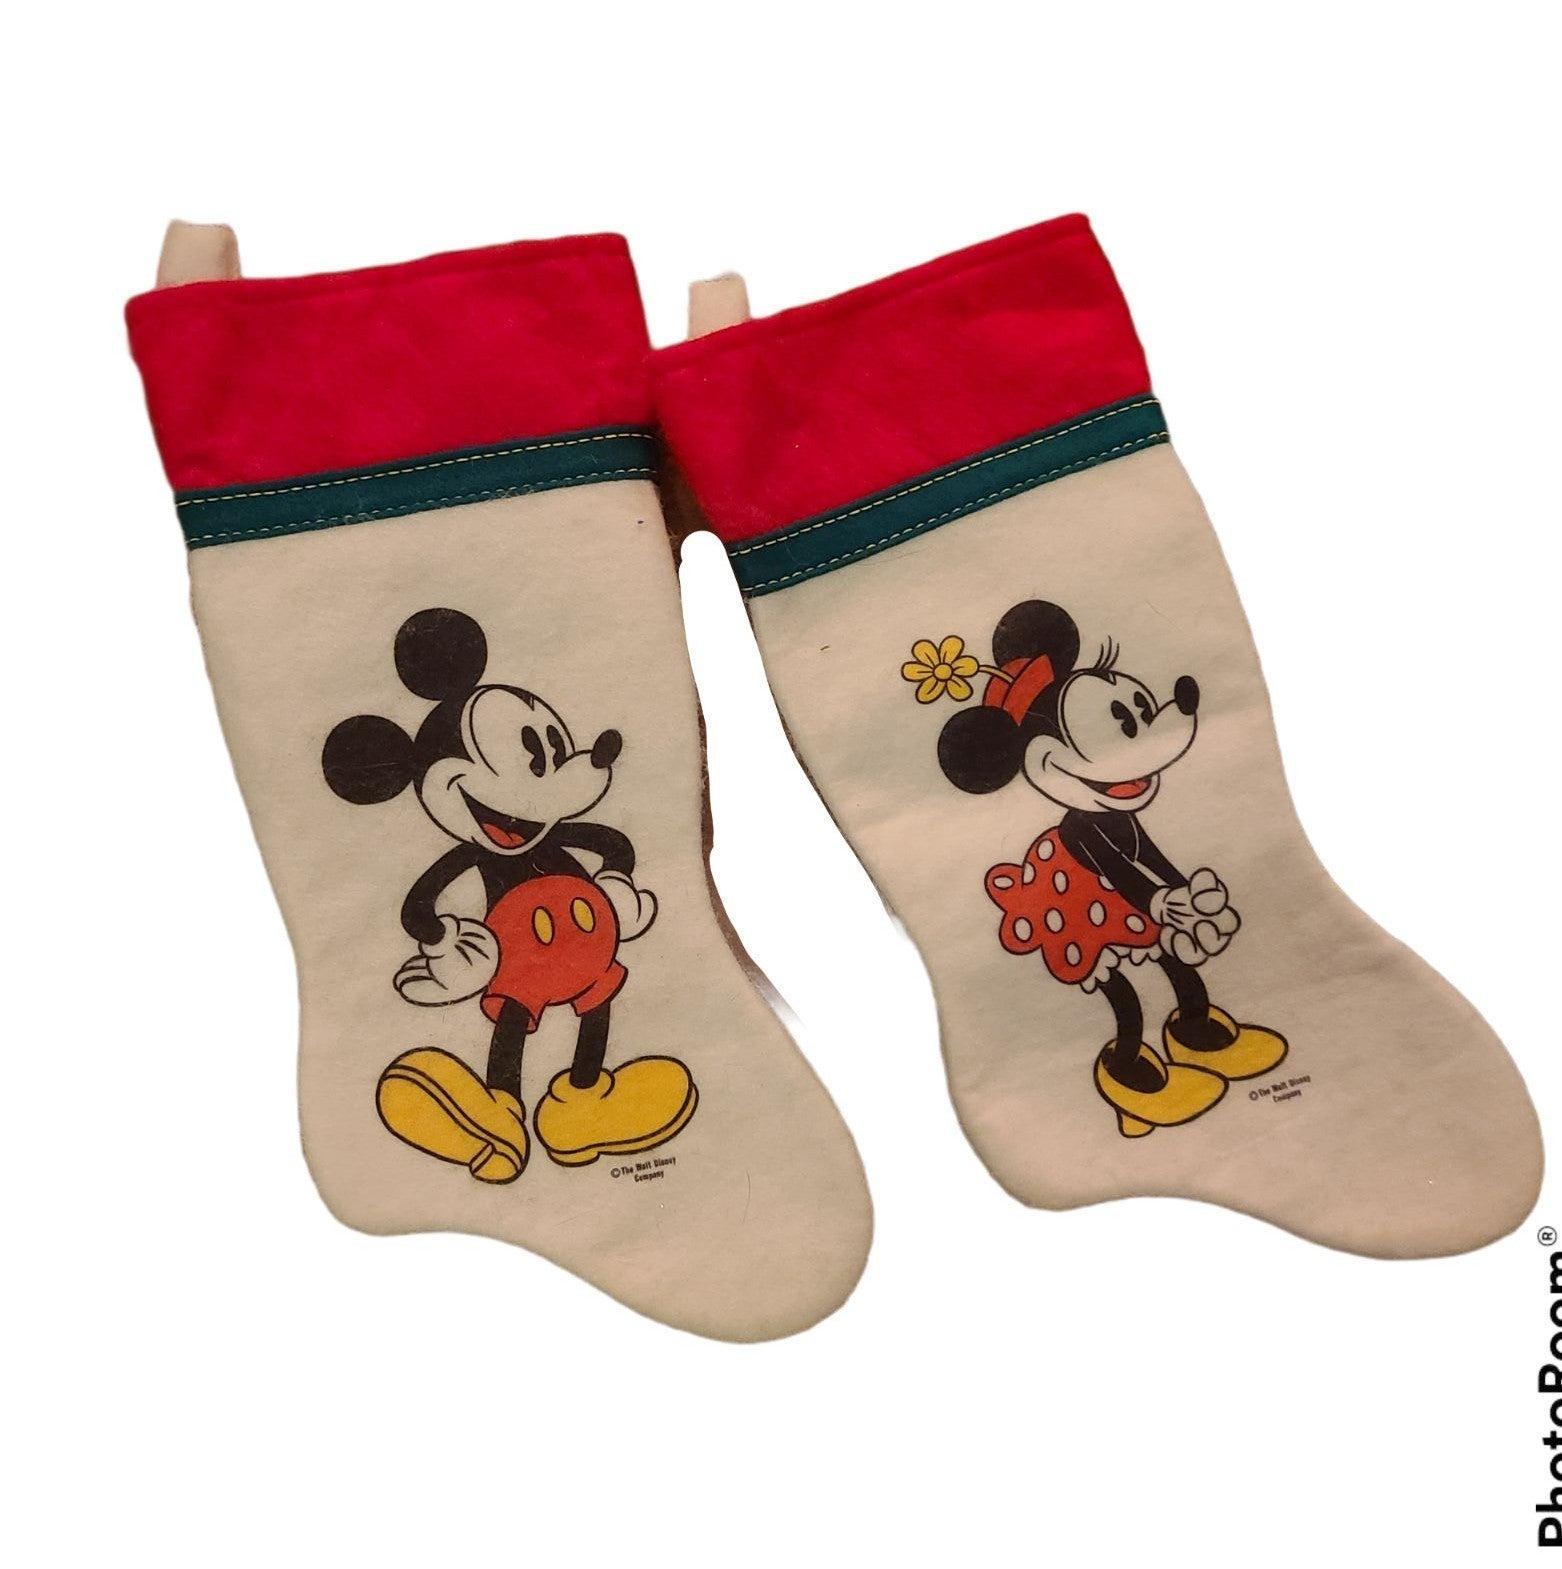 Vintage minnie mickey disney stockings 2